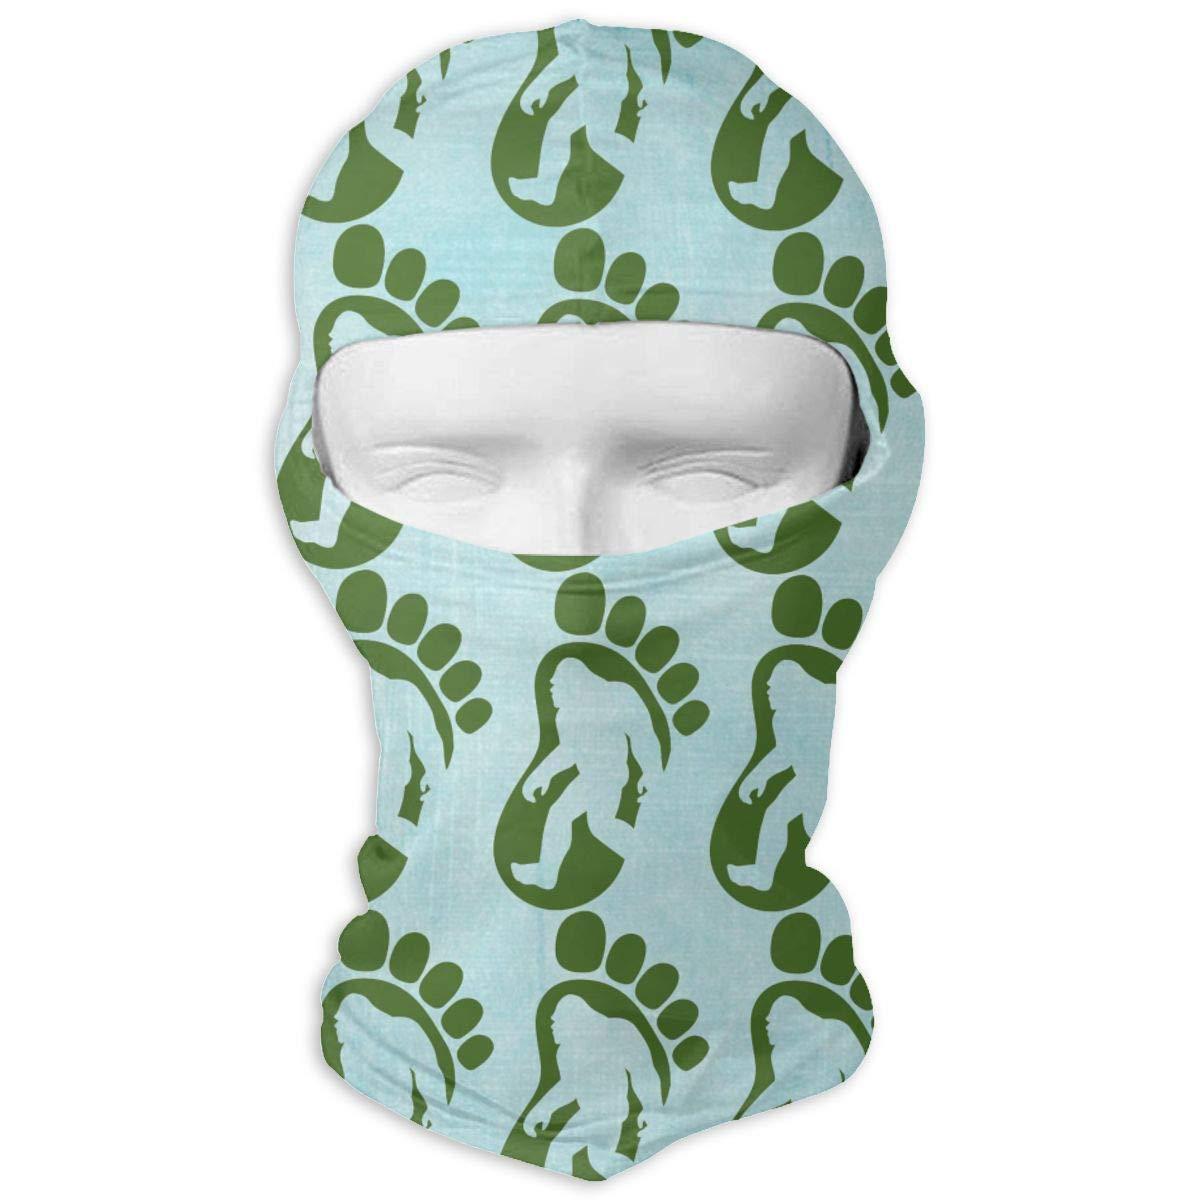 deyhfef Bigfoot Footprint Balaclava UV Protection Windproof Ski Face Masks for Cycling Outdoor Sports Full Face Mask Breathable